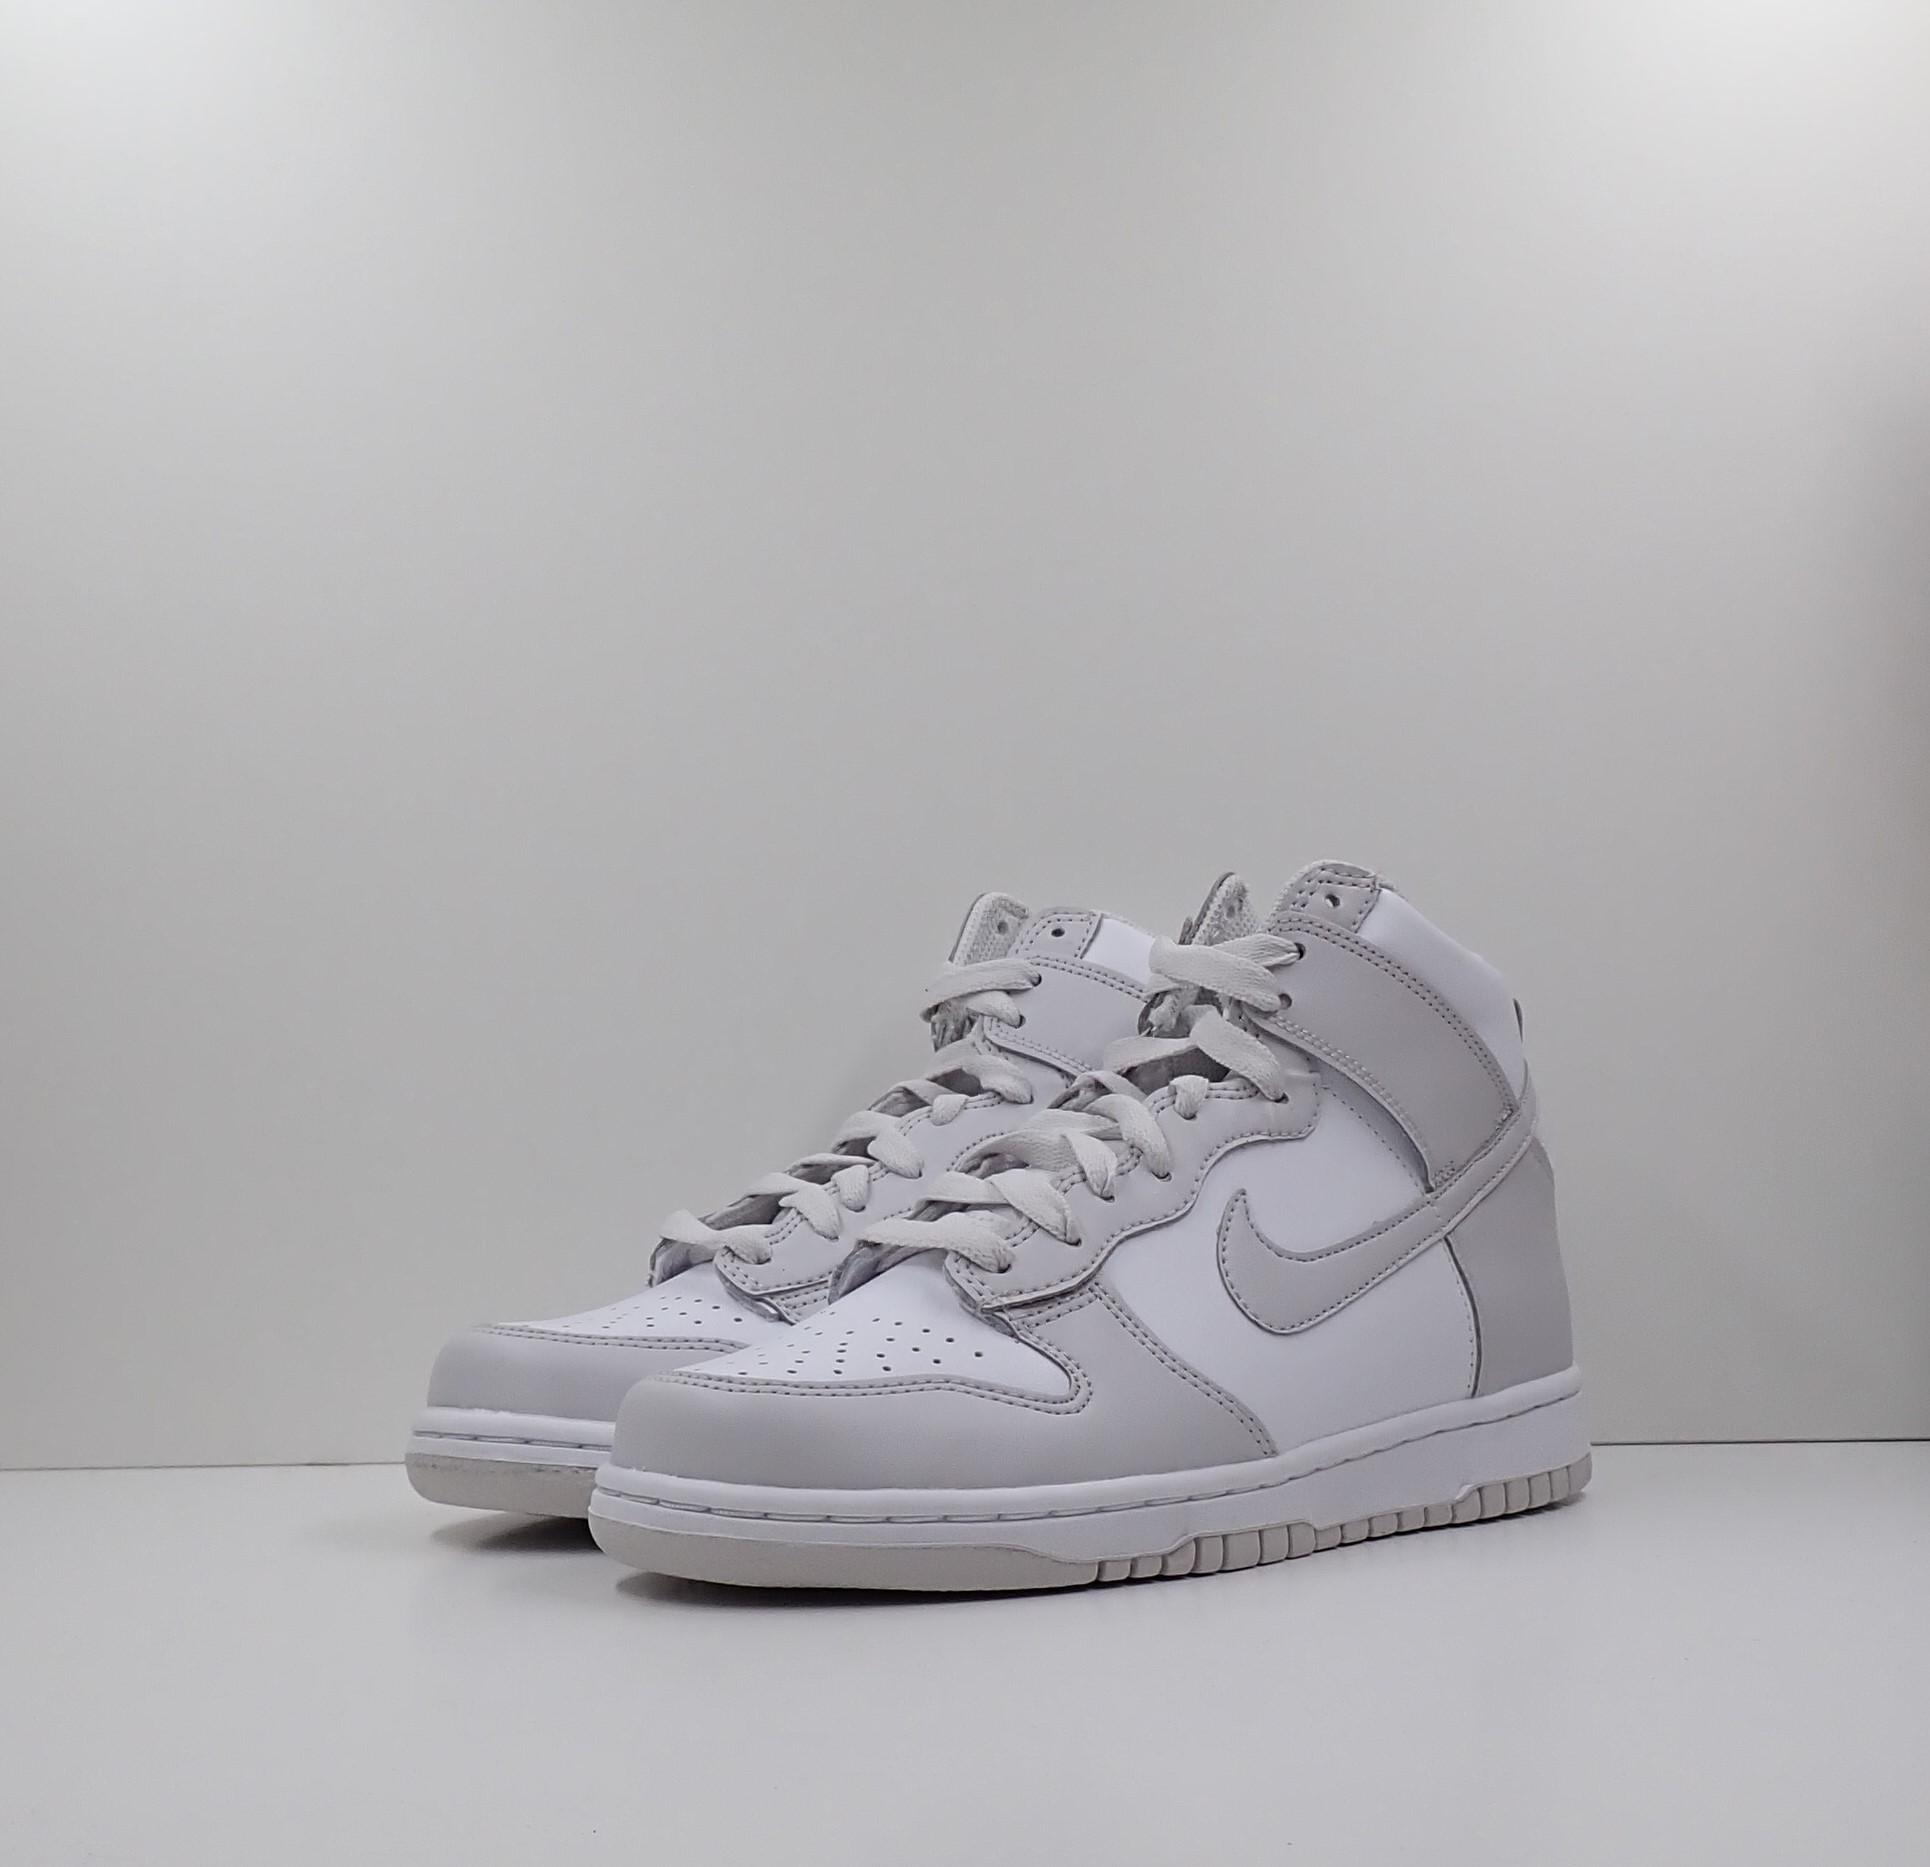 Nike Dunk High Retro White Vast Grey (GS)